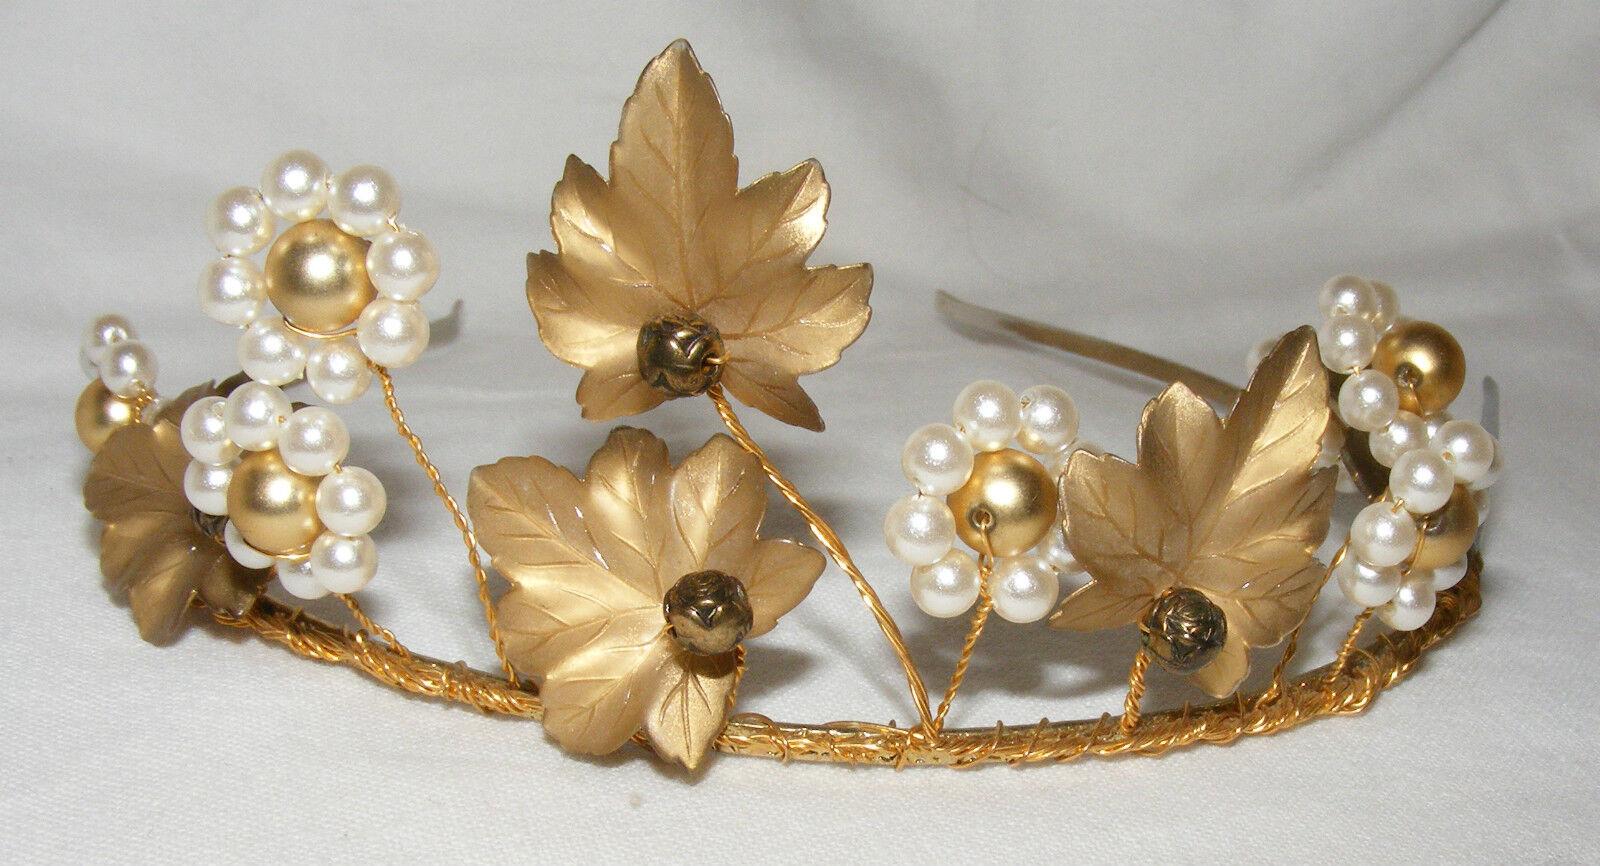 Gorgeous Rhapsody Bride Bridesmaid Tiara Headband Bronze Leaf and Pearls